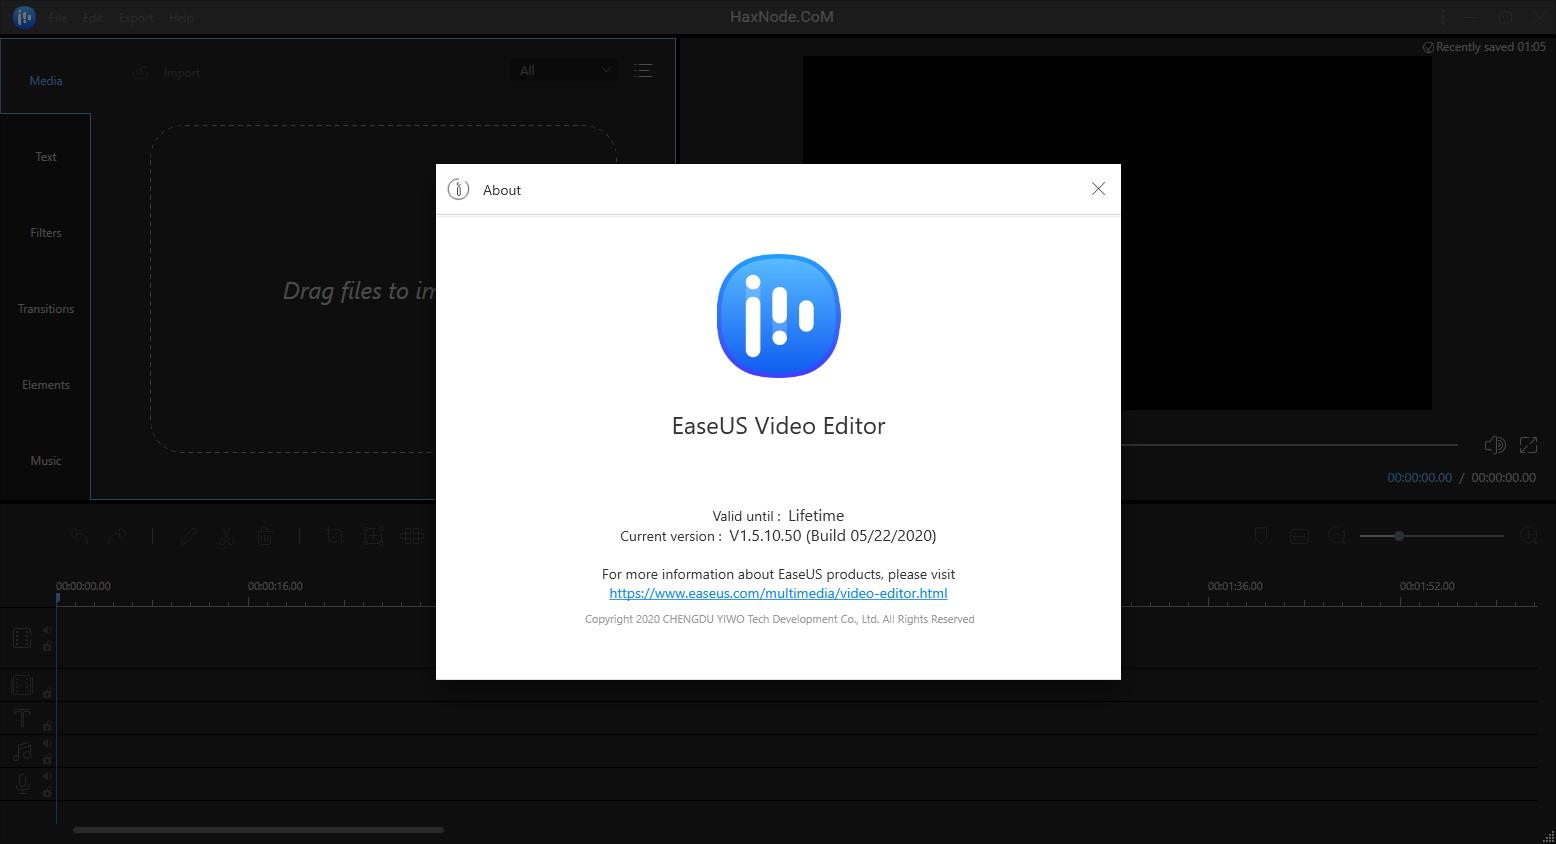 easeusvideoeditor1.5.10.50